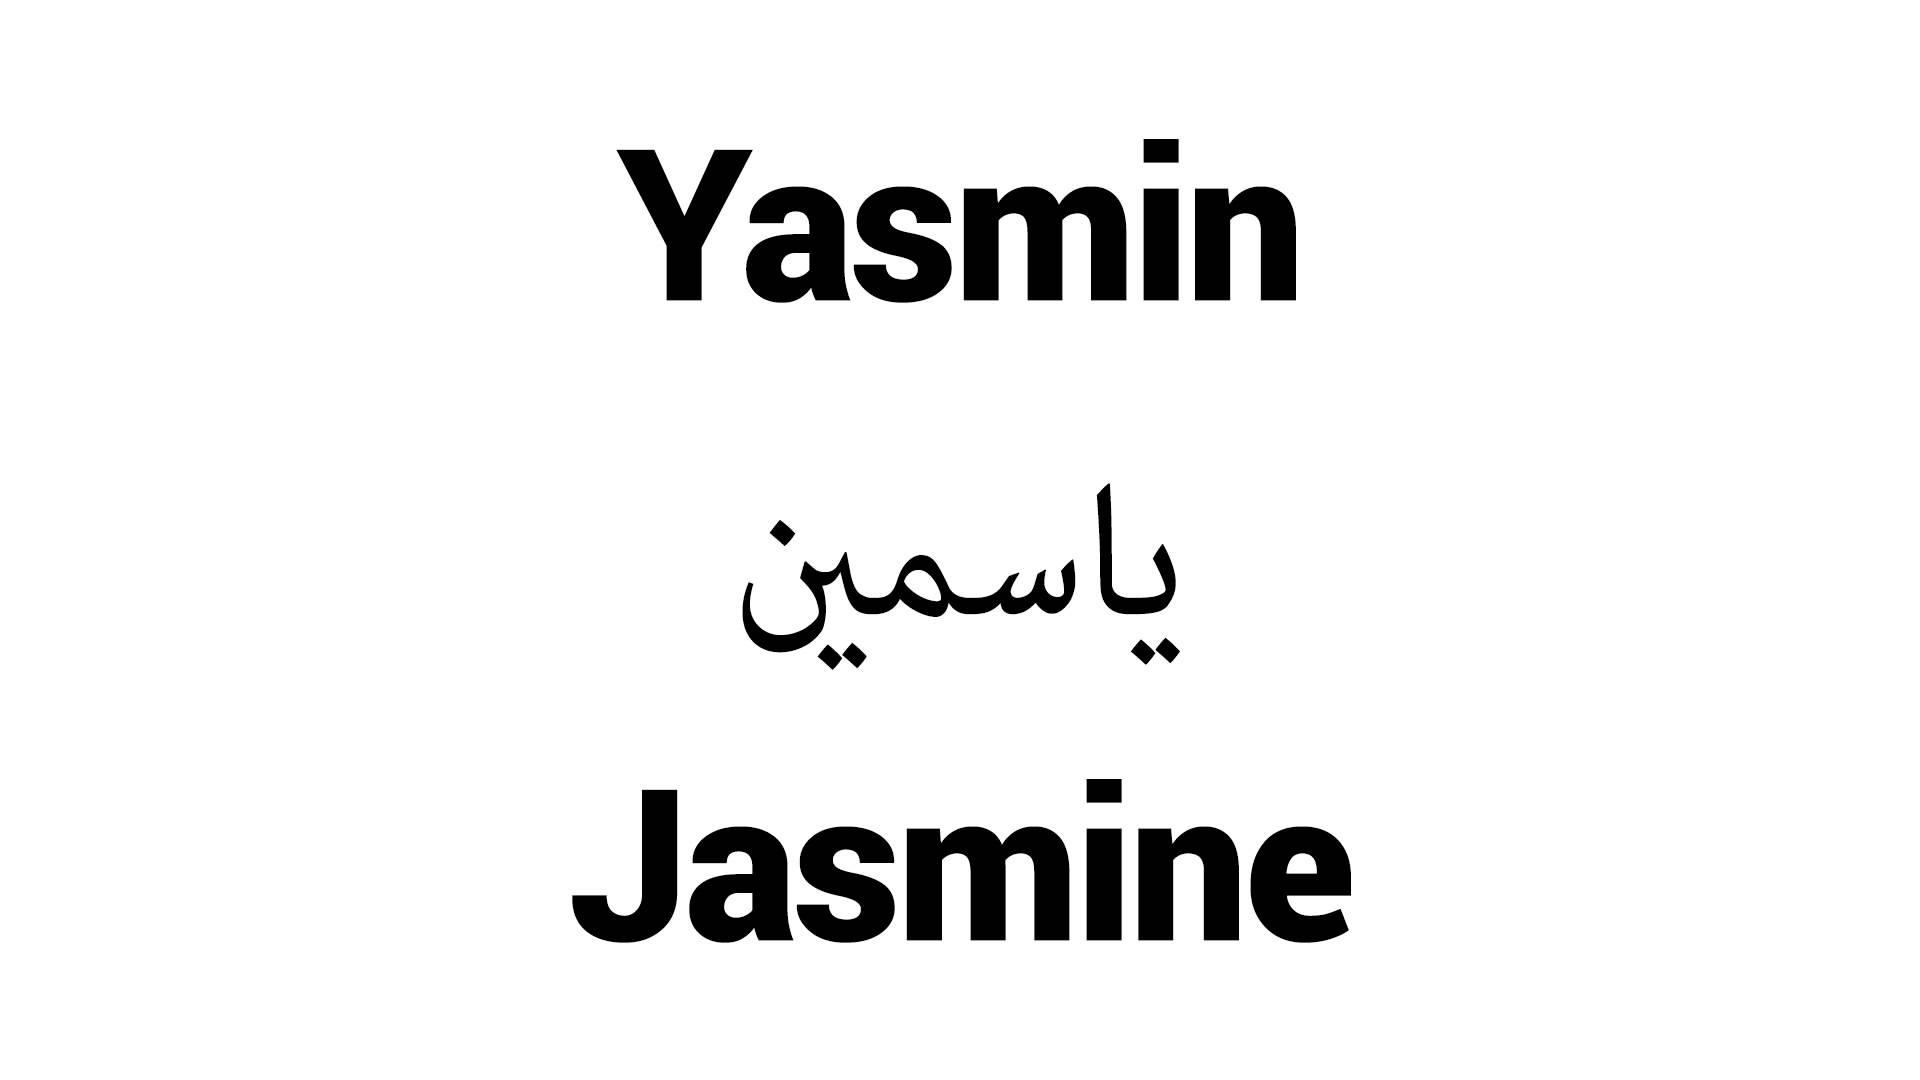 بالصور صور اسم ياسمين , اجمل صور لاسم ياسمين 3548 9